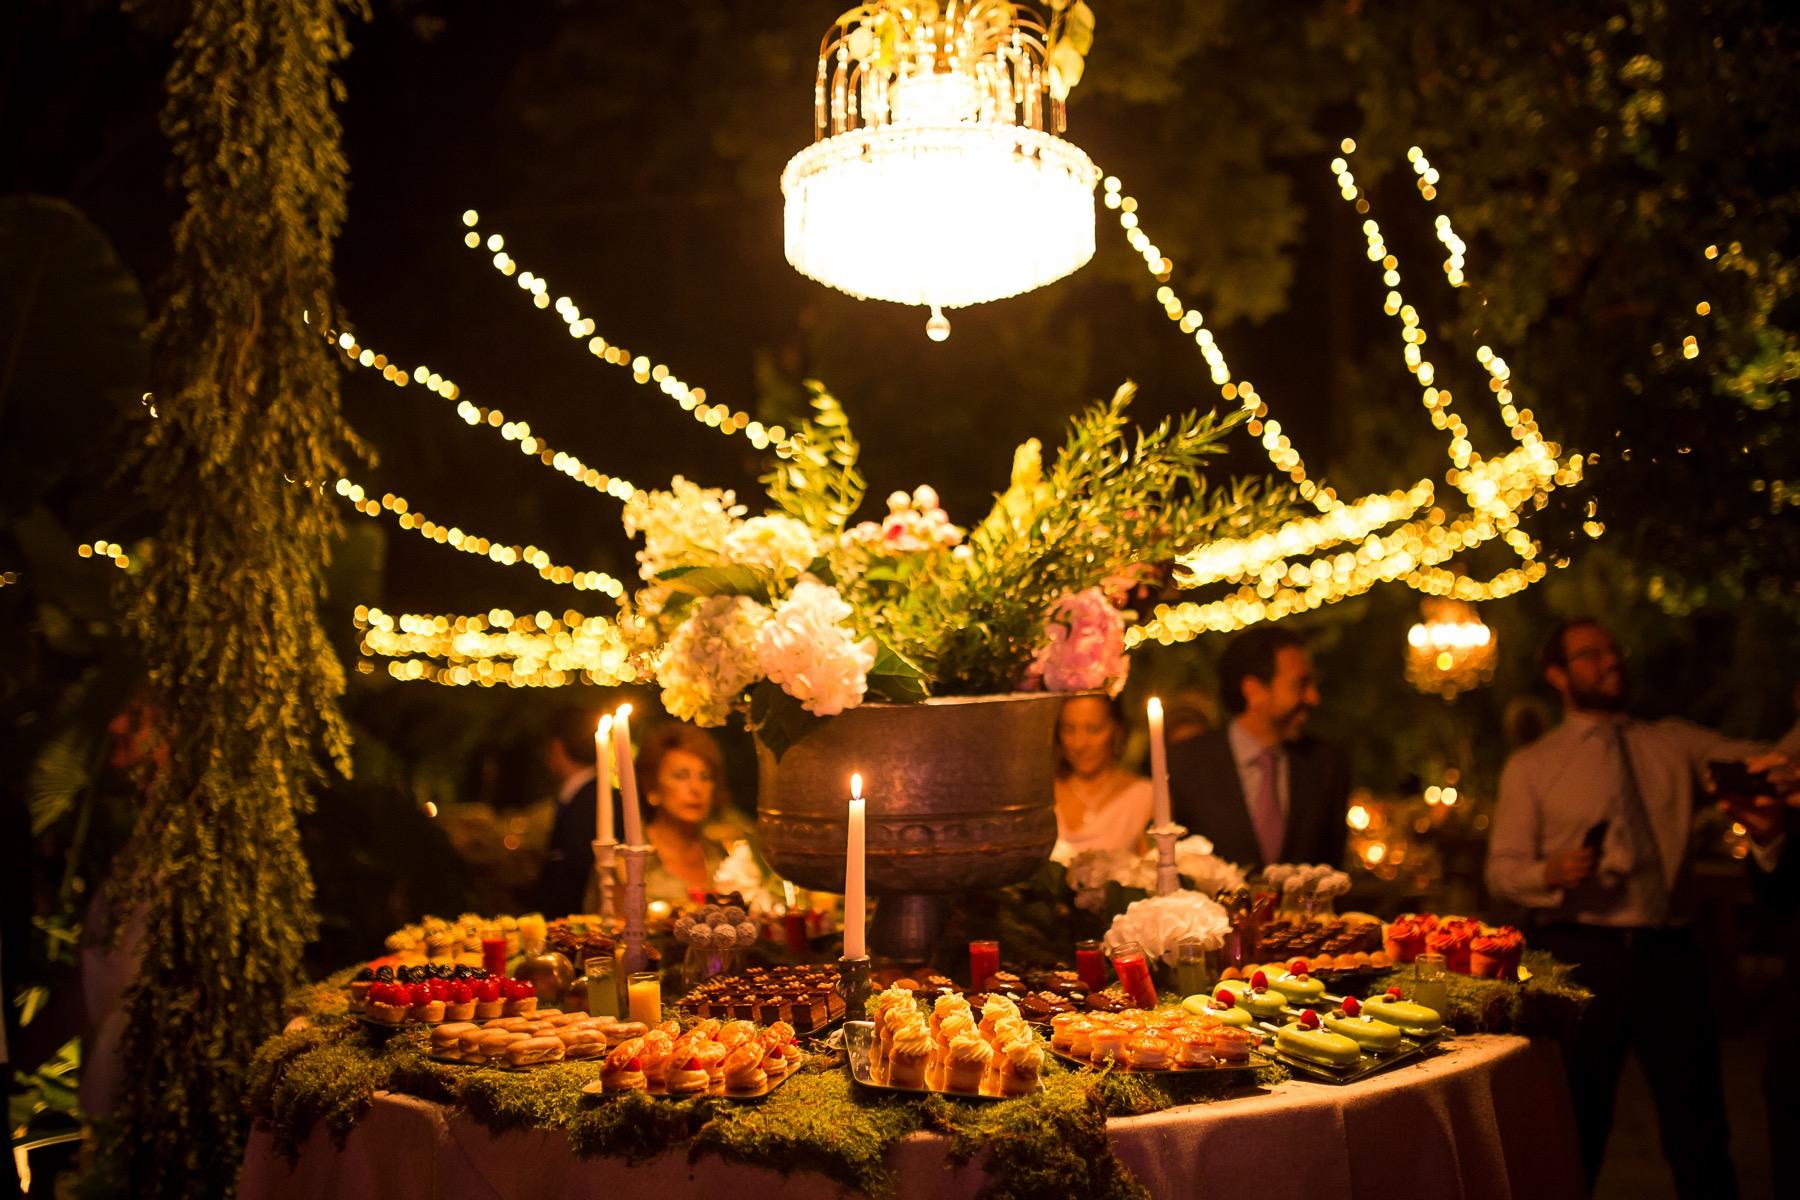 Si-Quiero-Wedding-Planner-By-Sira-Antequera-Bodas-Málaga-Marbella-Miami Natalia-Jaimex-3